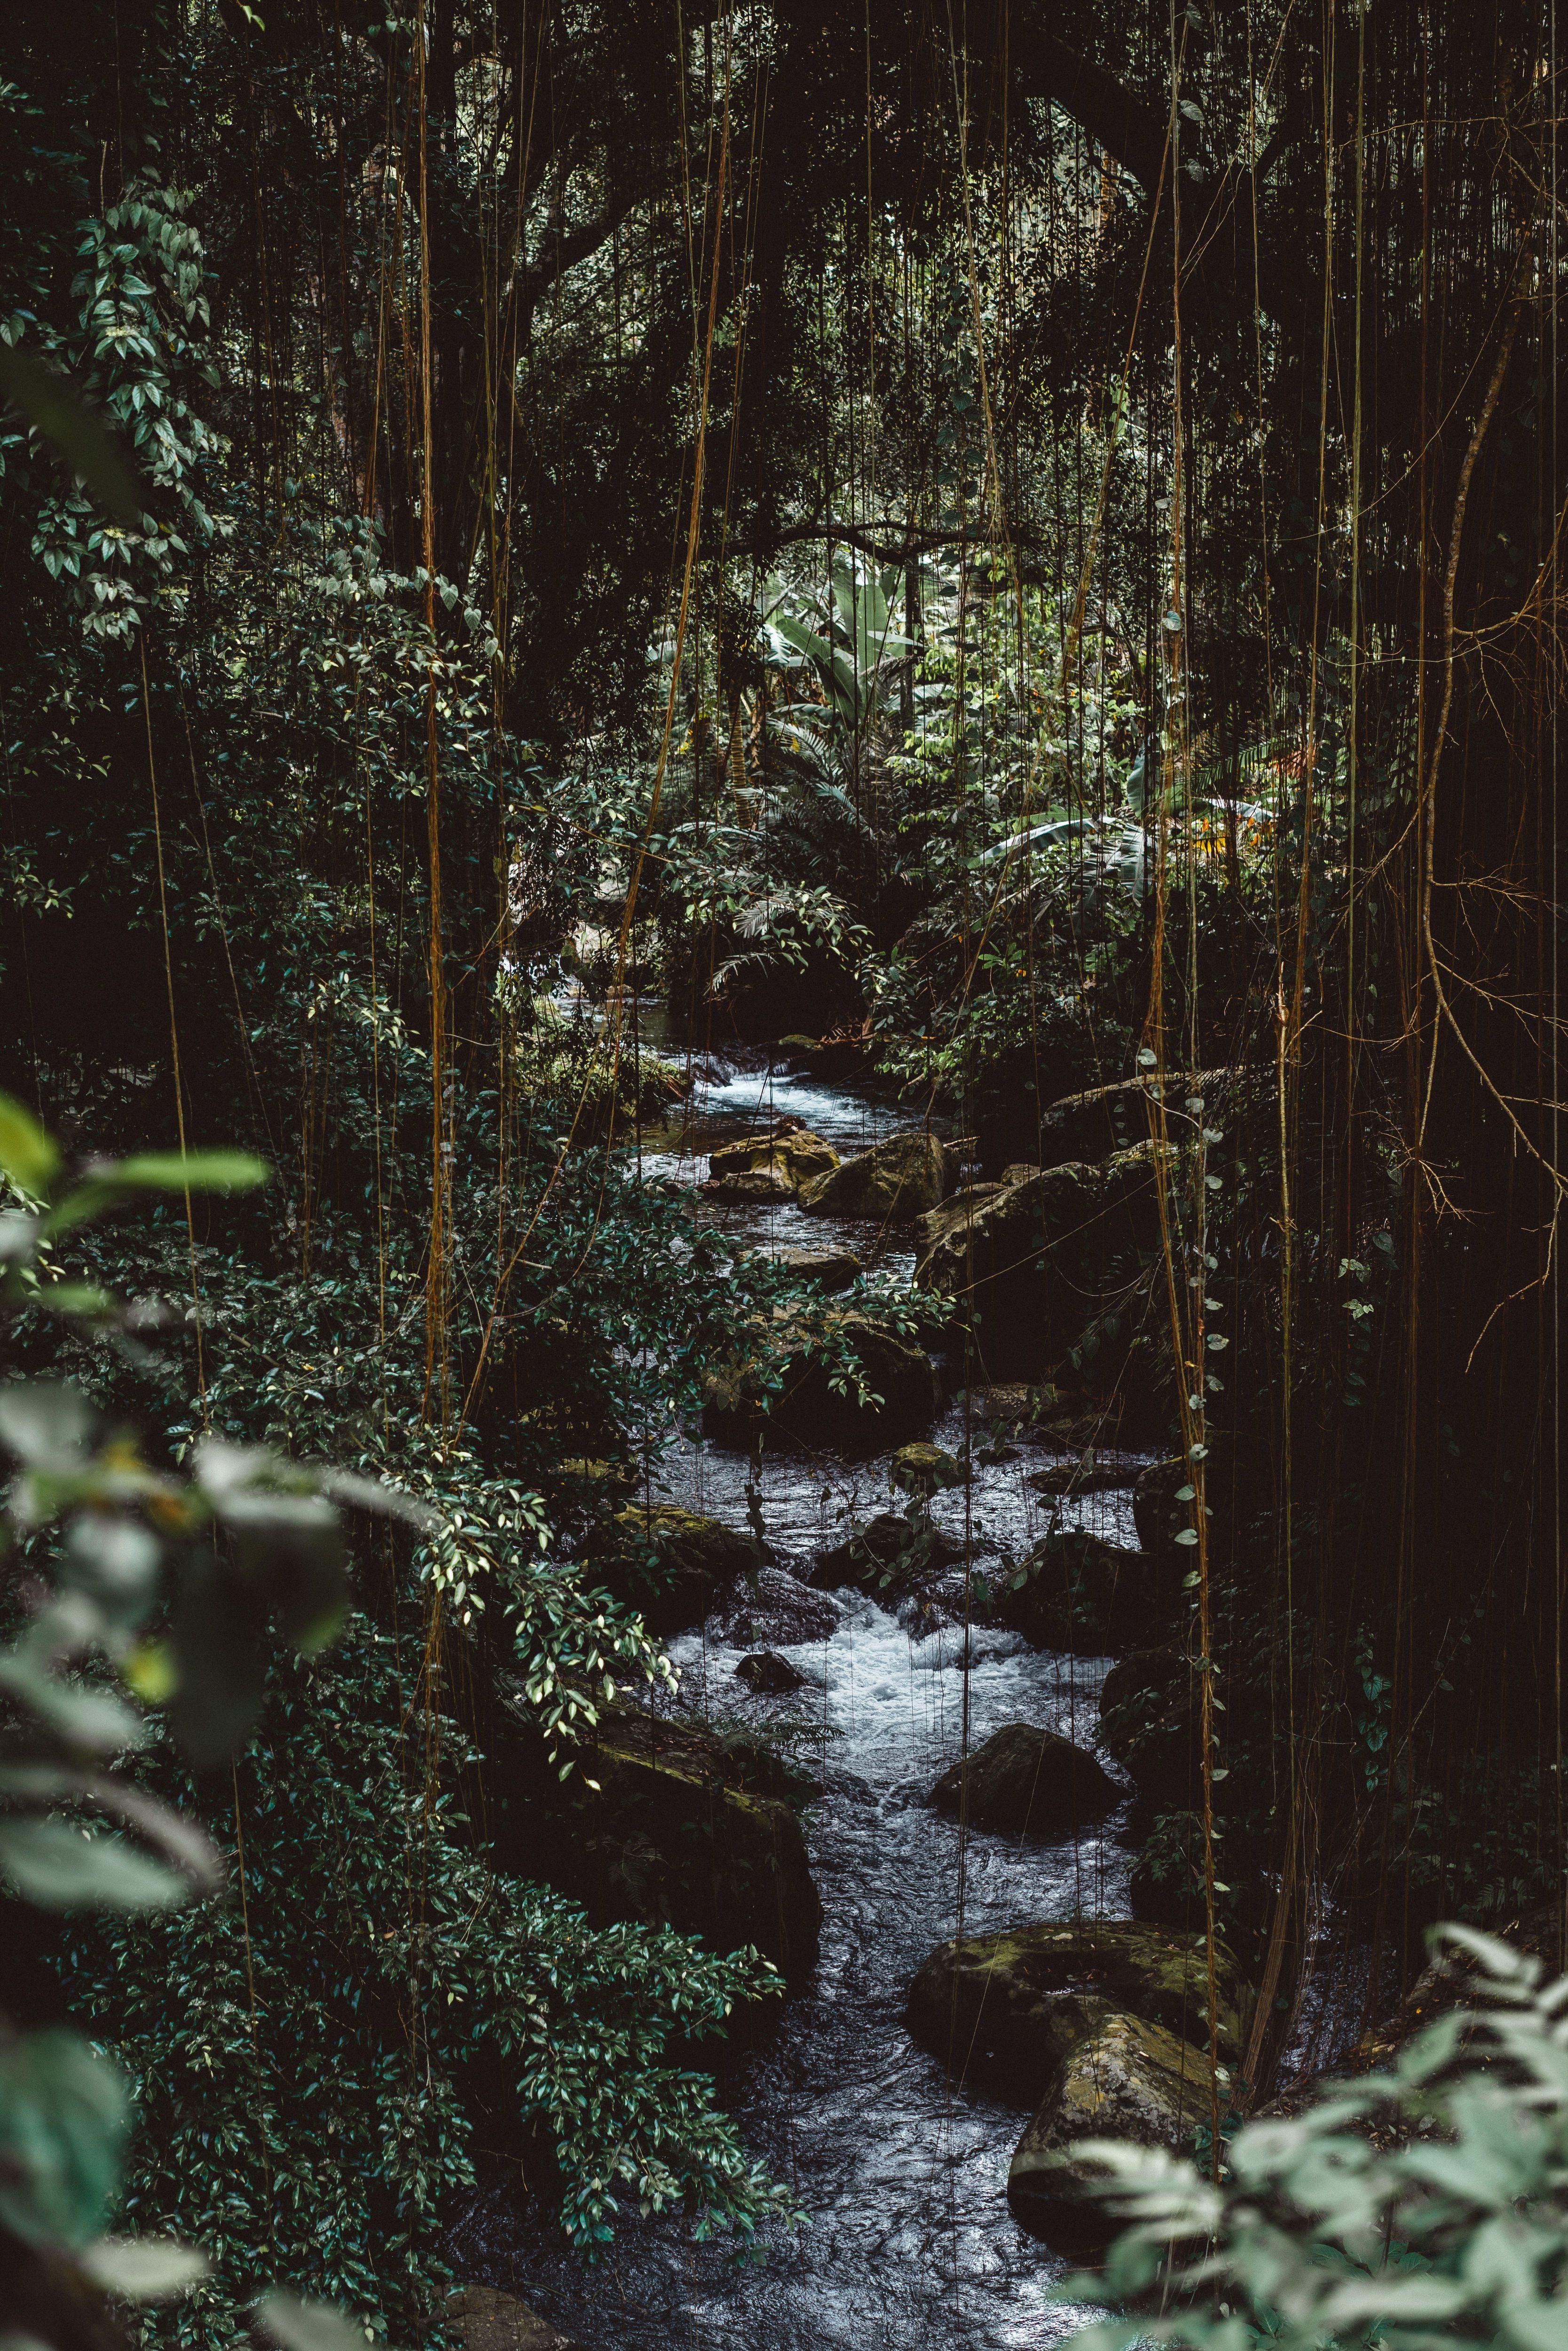 Tranquility Rainforest Meditation Jungle Pictures Nature Iphone Wallpaper Jungle Wallpaper